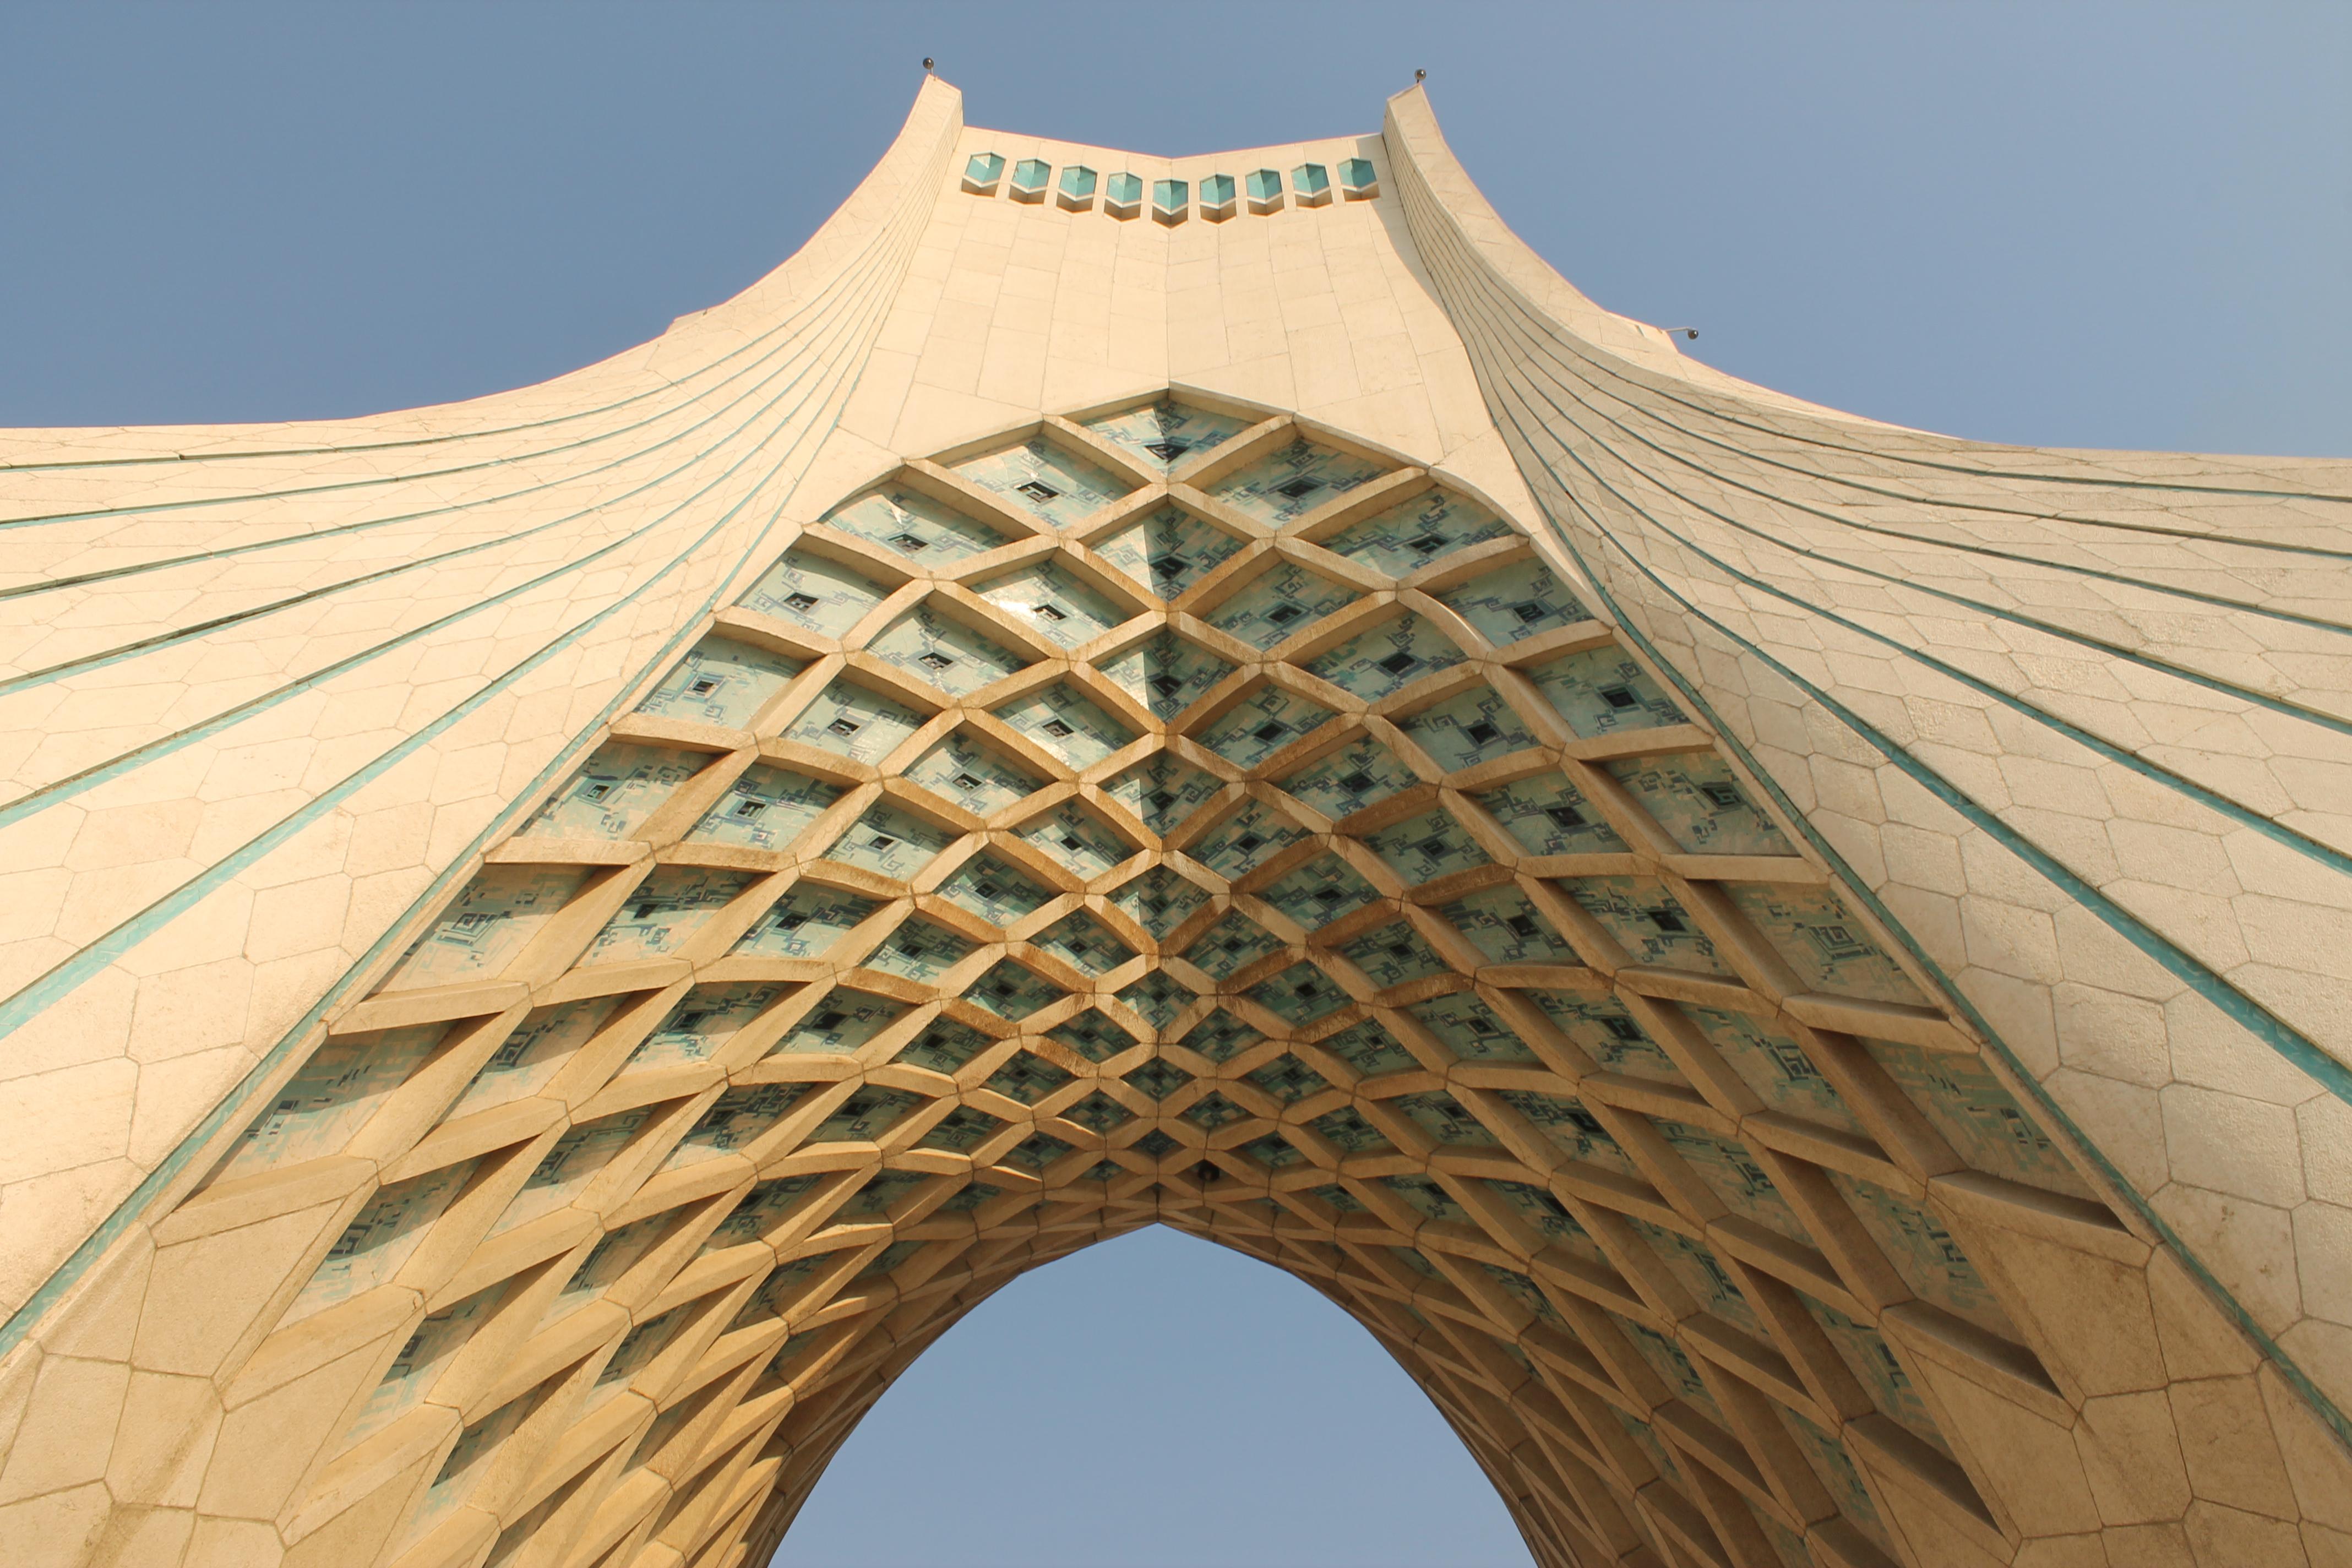 File:Azadi Tower - Tehran- Iran (3).jpg - Wikimedia Commons